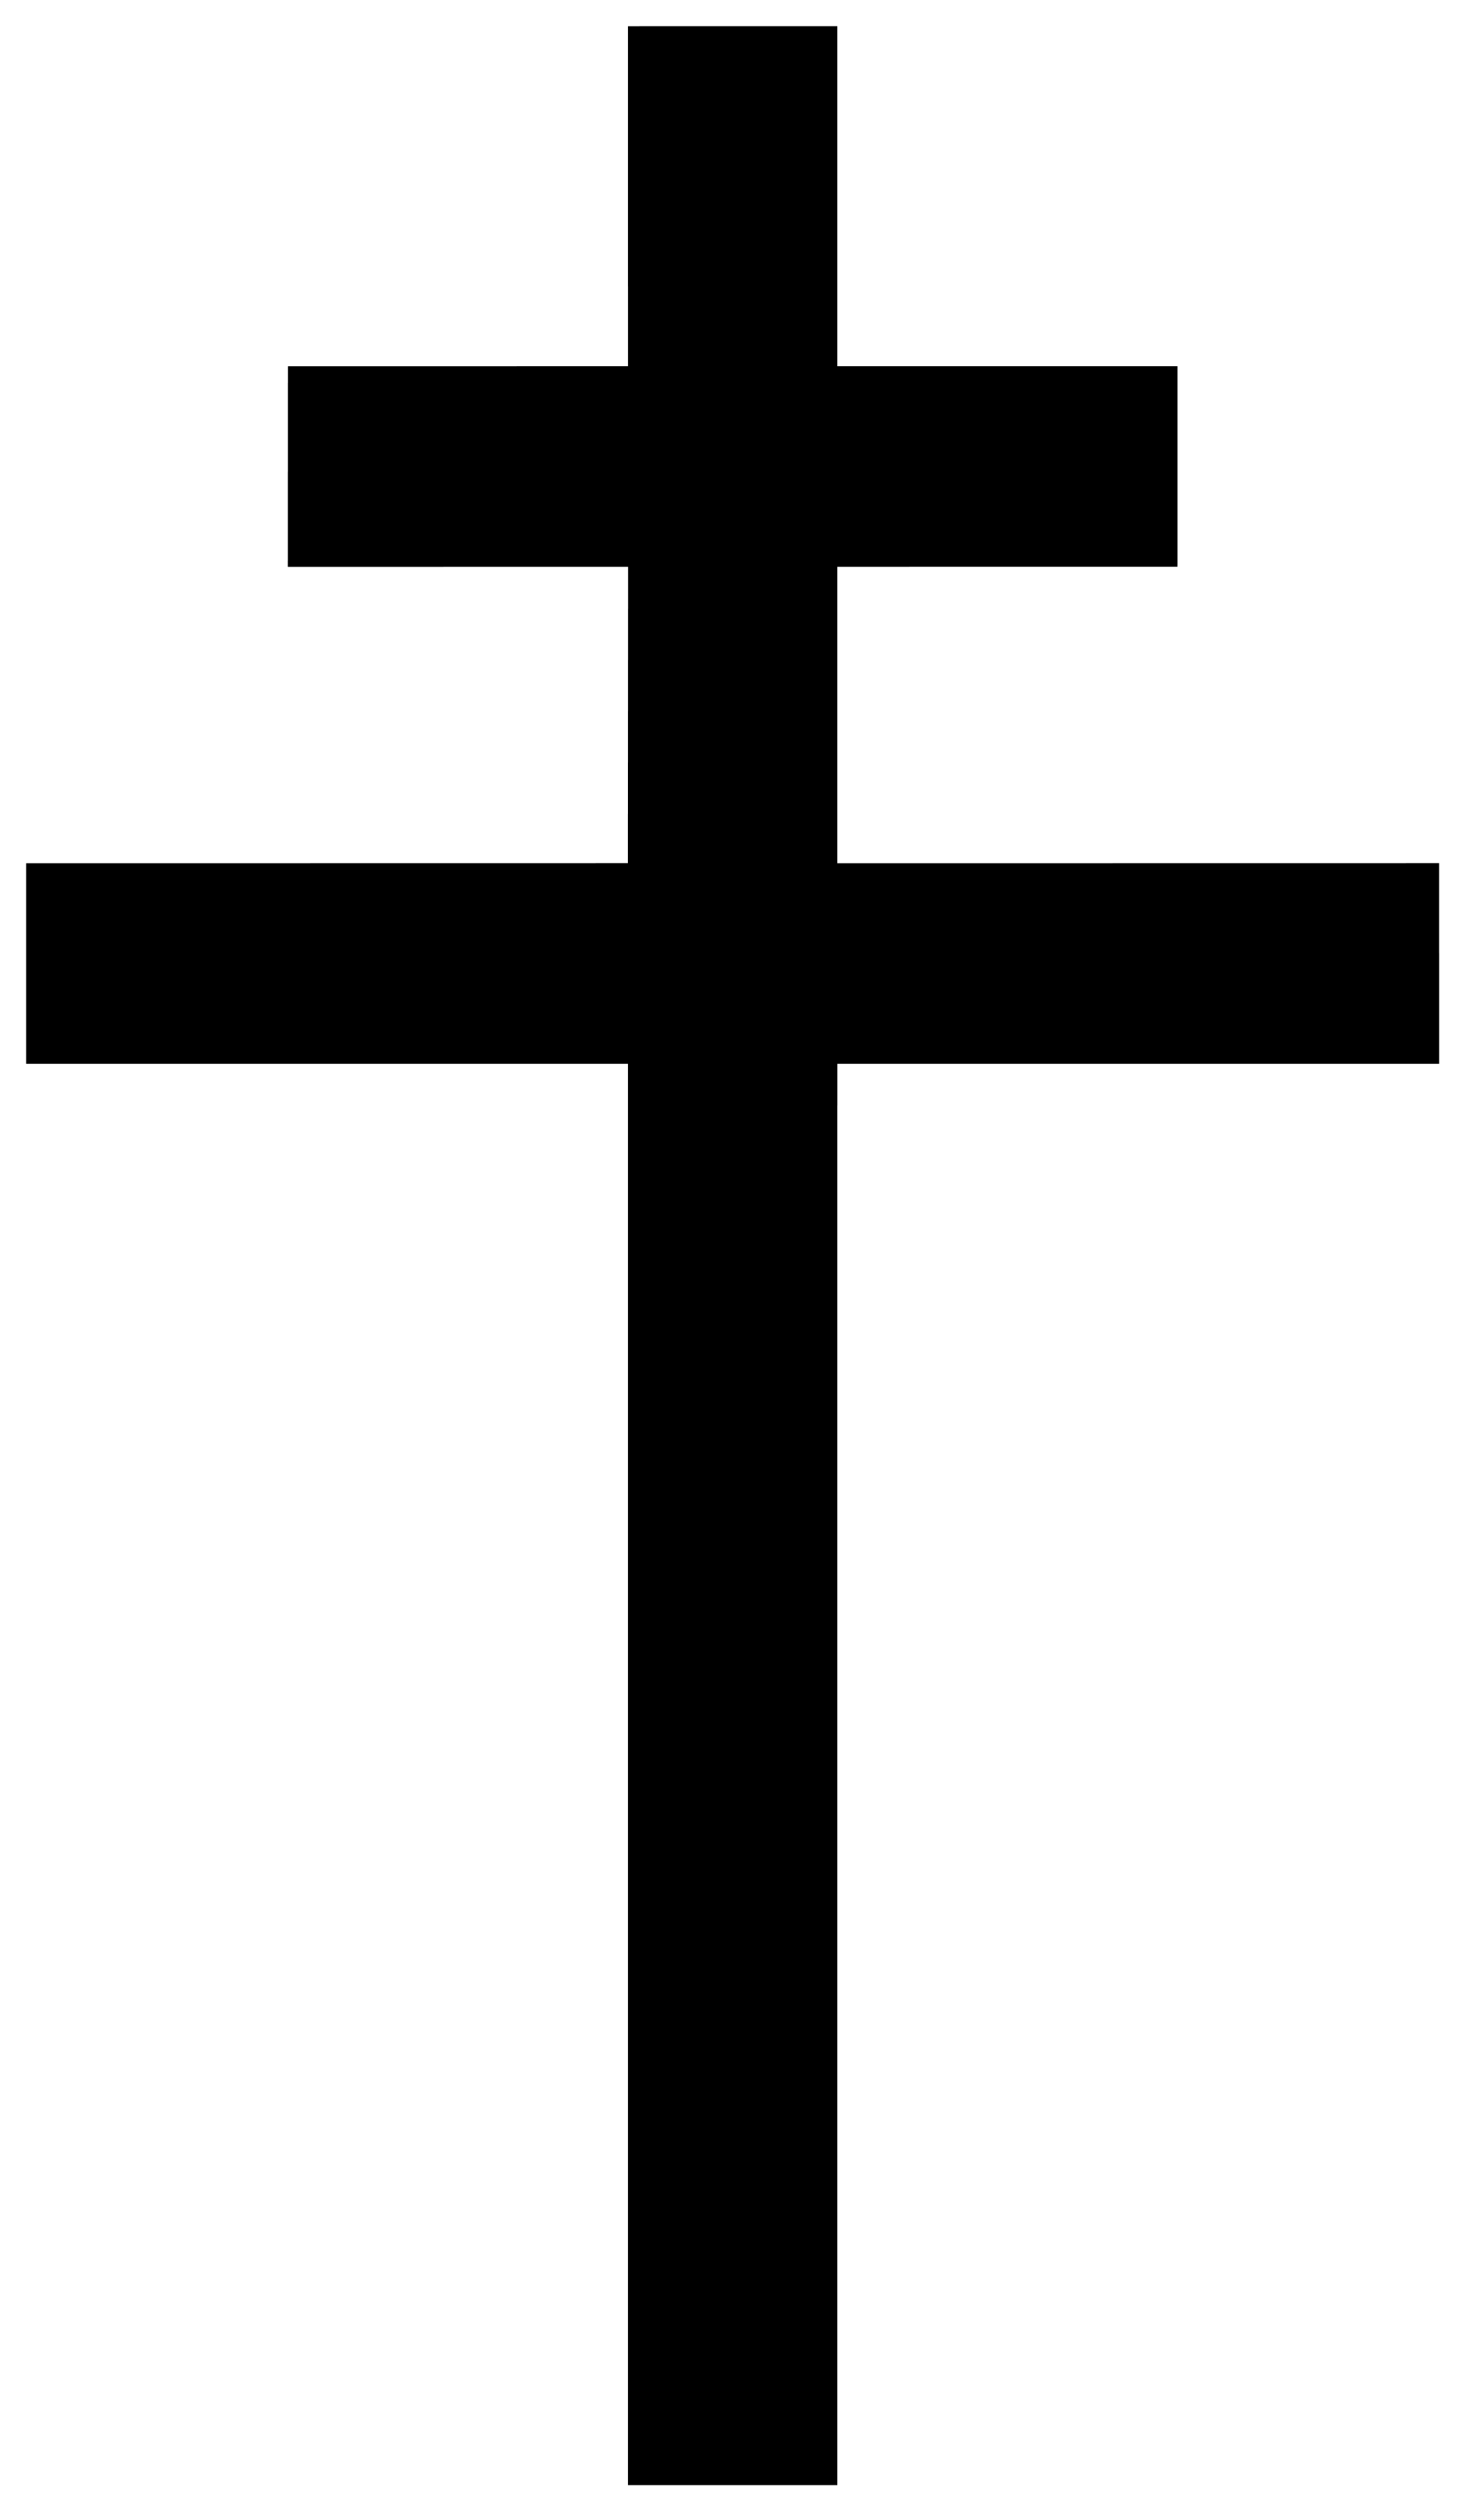 2000x3420 Crosses In Heraldry